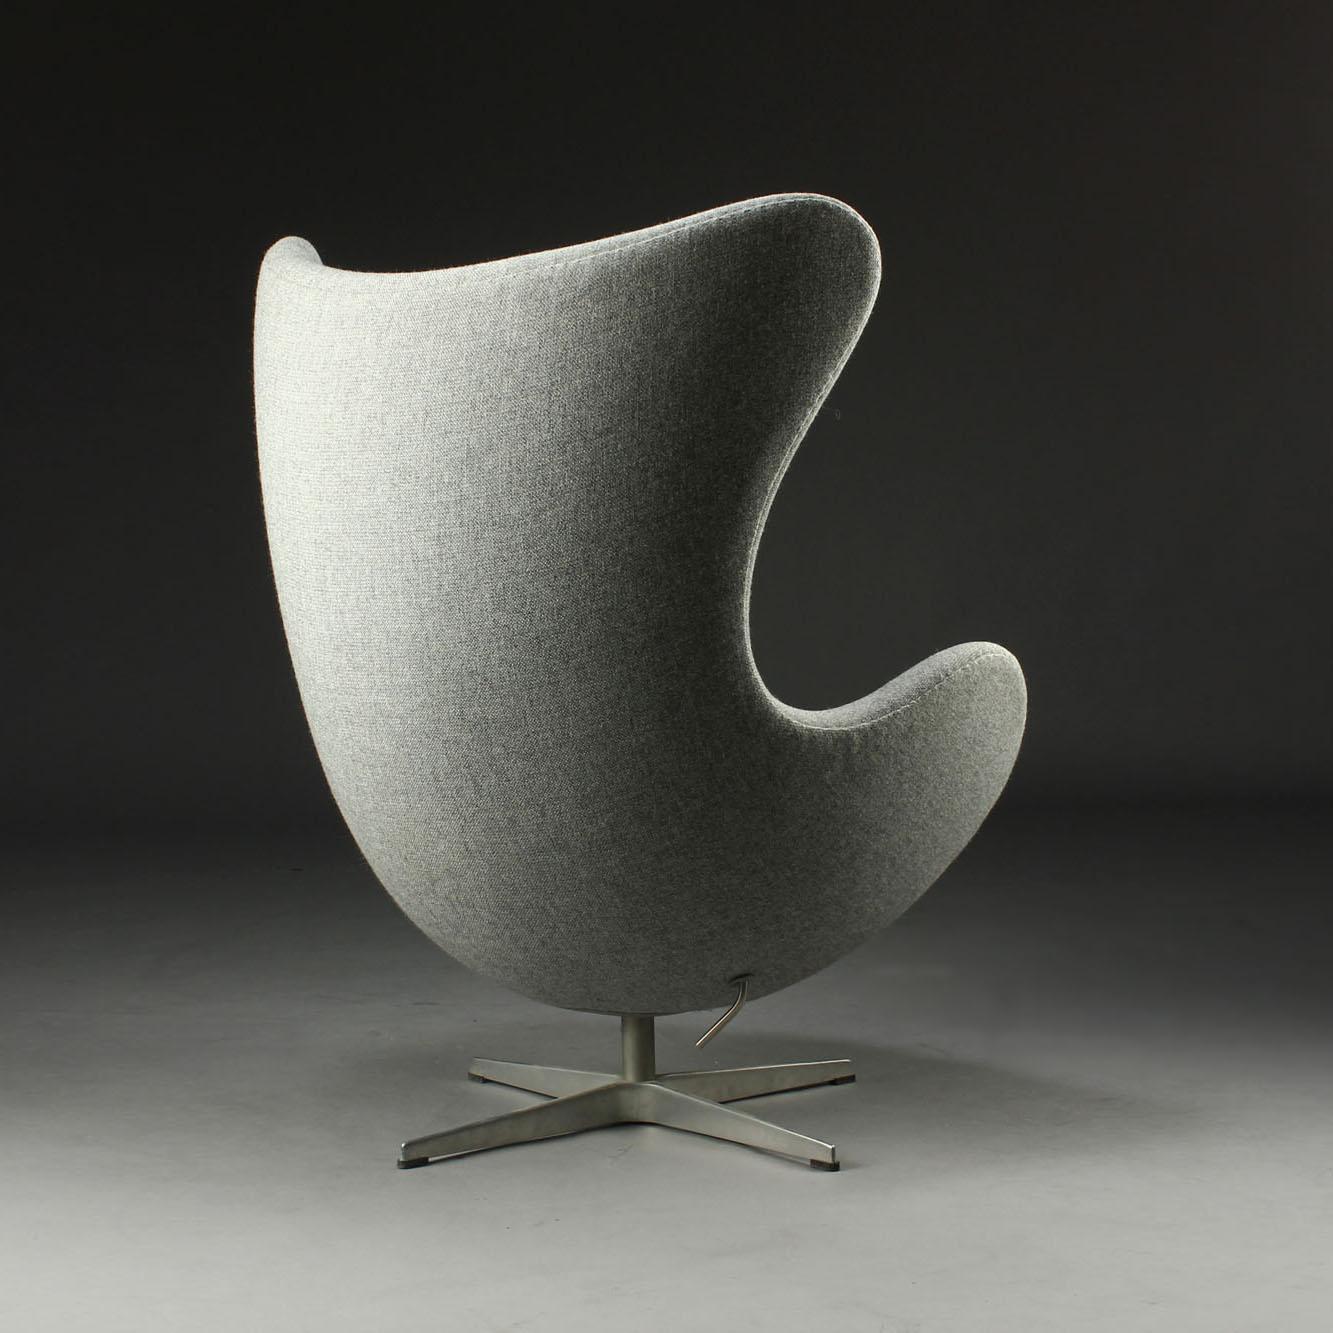 fritz hansen arne jacobsen egg chair in kvadrat tonica. Black Bedroom Furniture Sets. Home Design Ideas